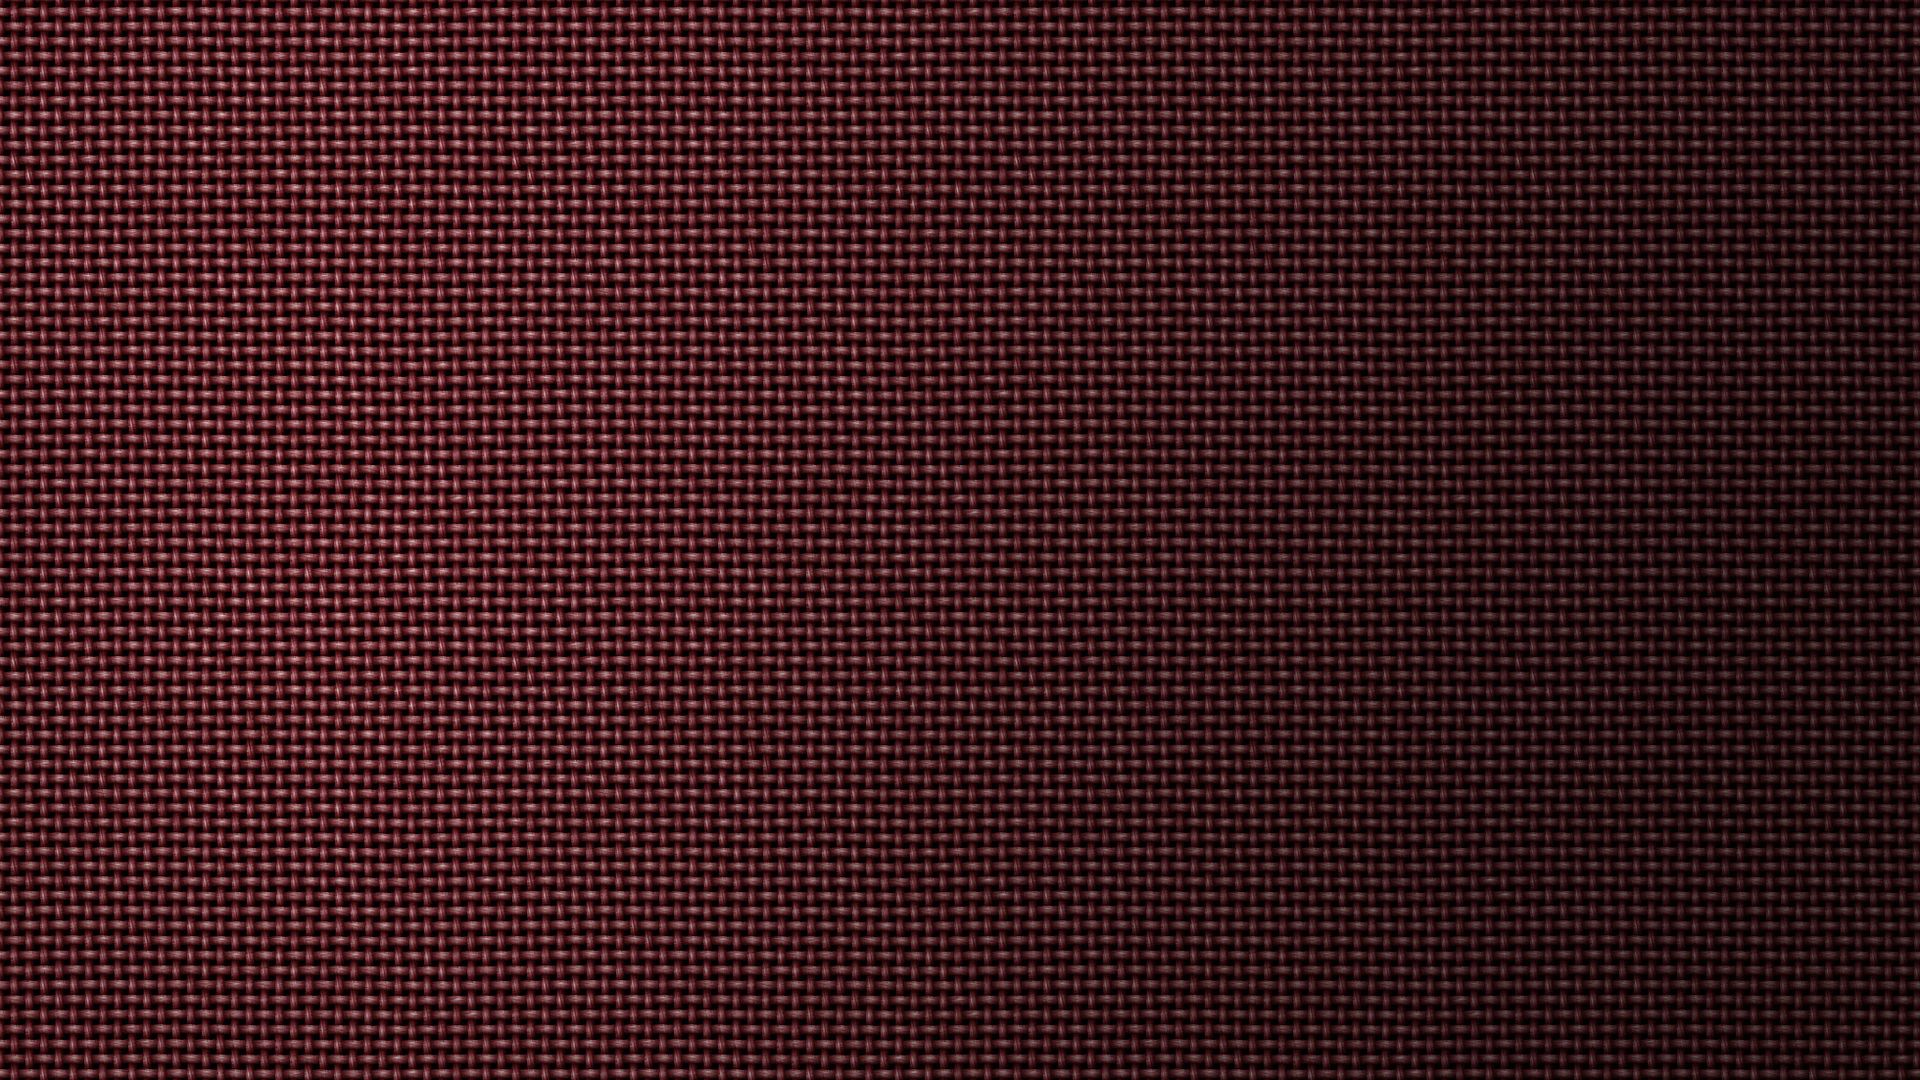 Burgundy Wallpaper